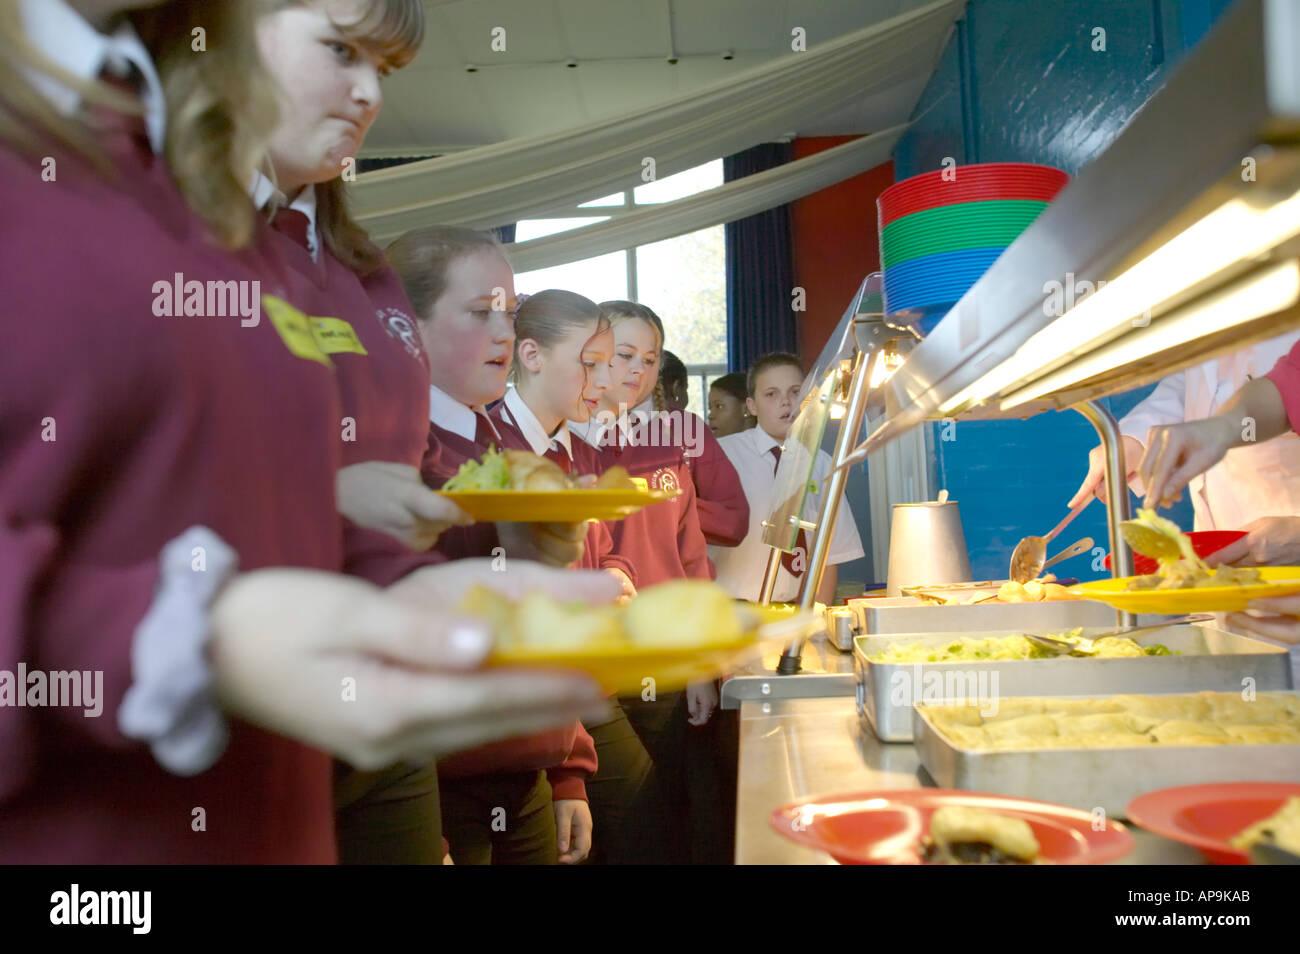 School Dinners Kent UK - Stock Image